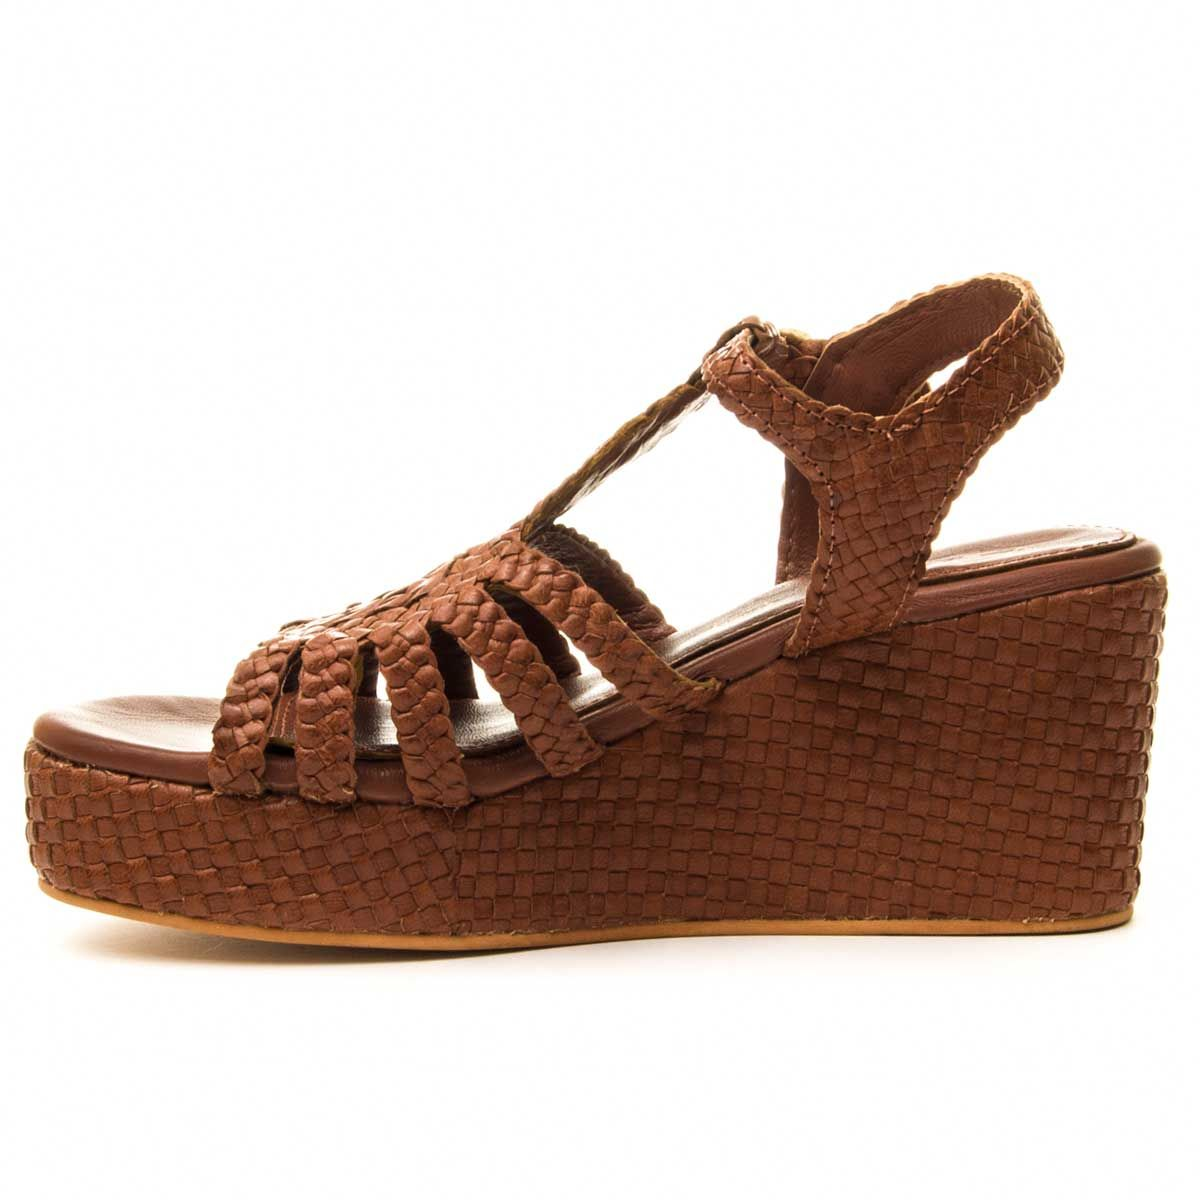 Montevita Chunky Heel Sandal in Camel